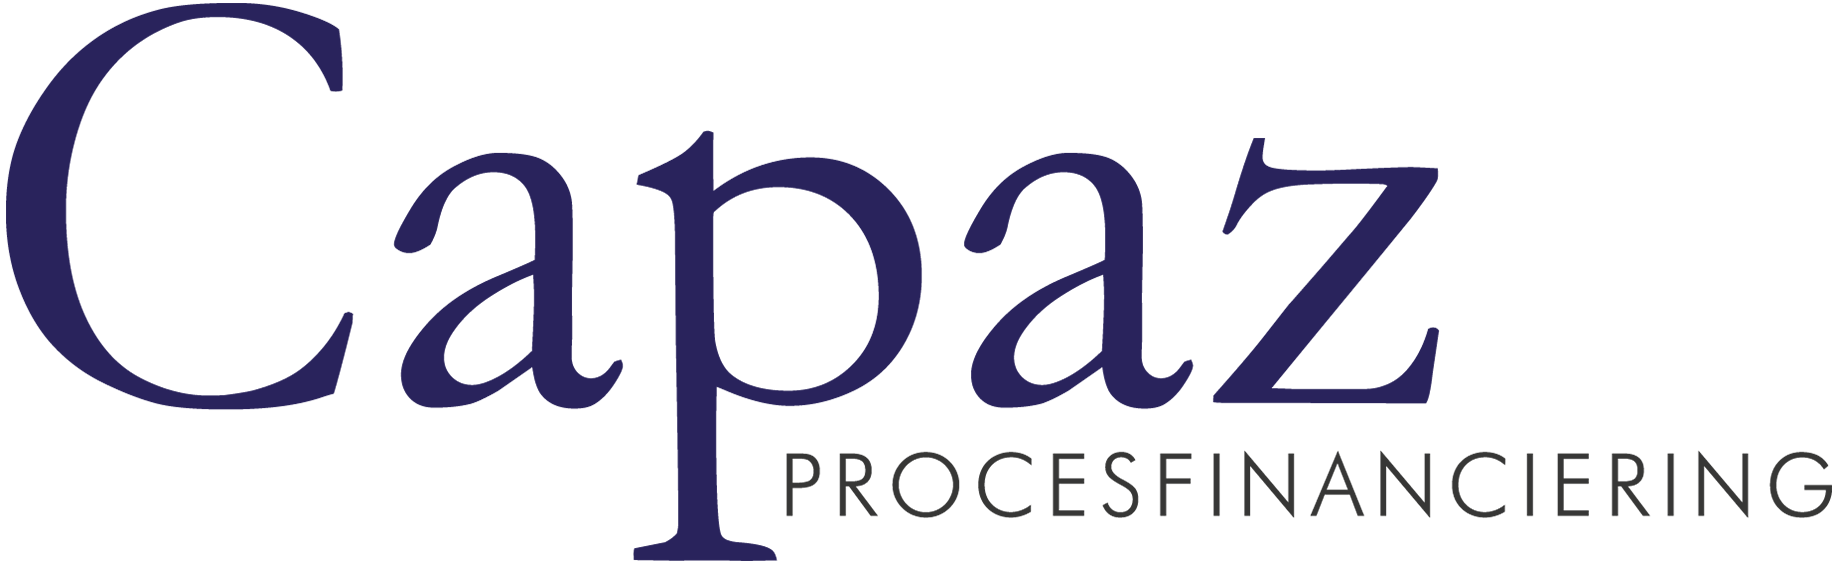 Capaz logo